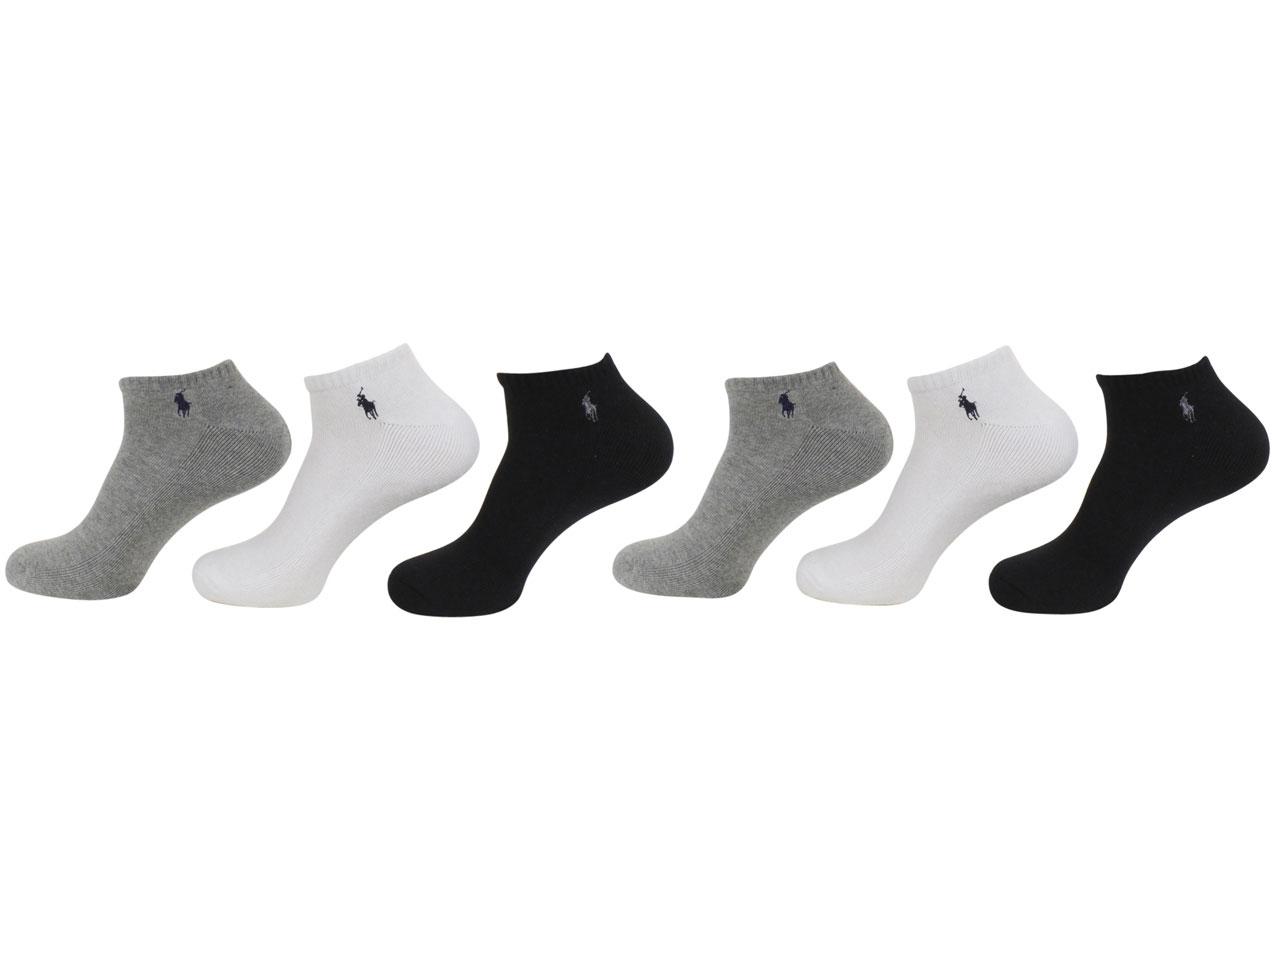 Fits Shoe Sizes 6-12.5 Polo Ralph Lauren Crew Socks 4 Pairs Colors Black//Gray